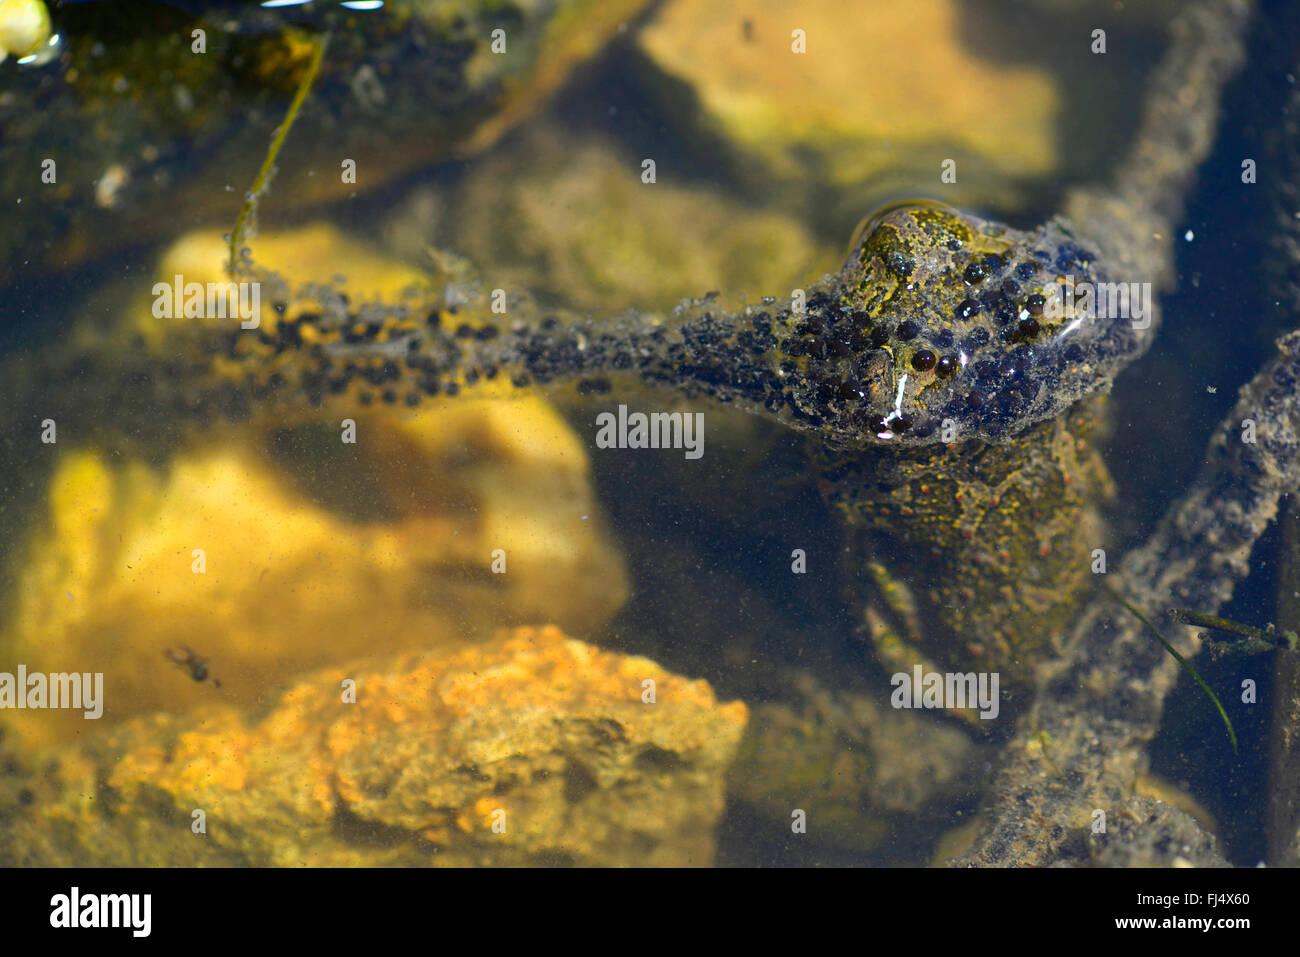 Eastern European spadefoot, Syrian spadefoot (Pelobates syriacus), spawn of the Syrian spadefoot, Romania, Dobrudscha, Biosphaerenreservat Donaudelta Stock Photo